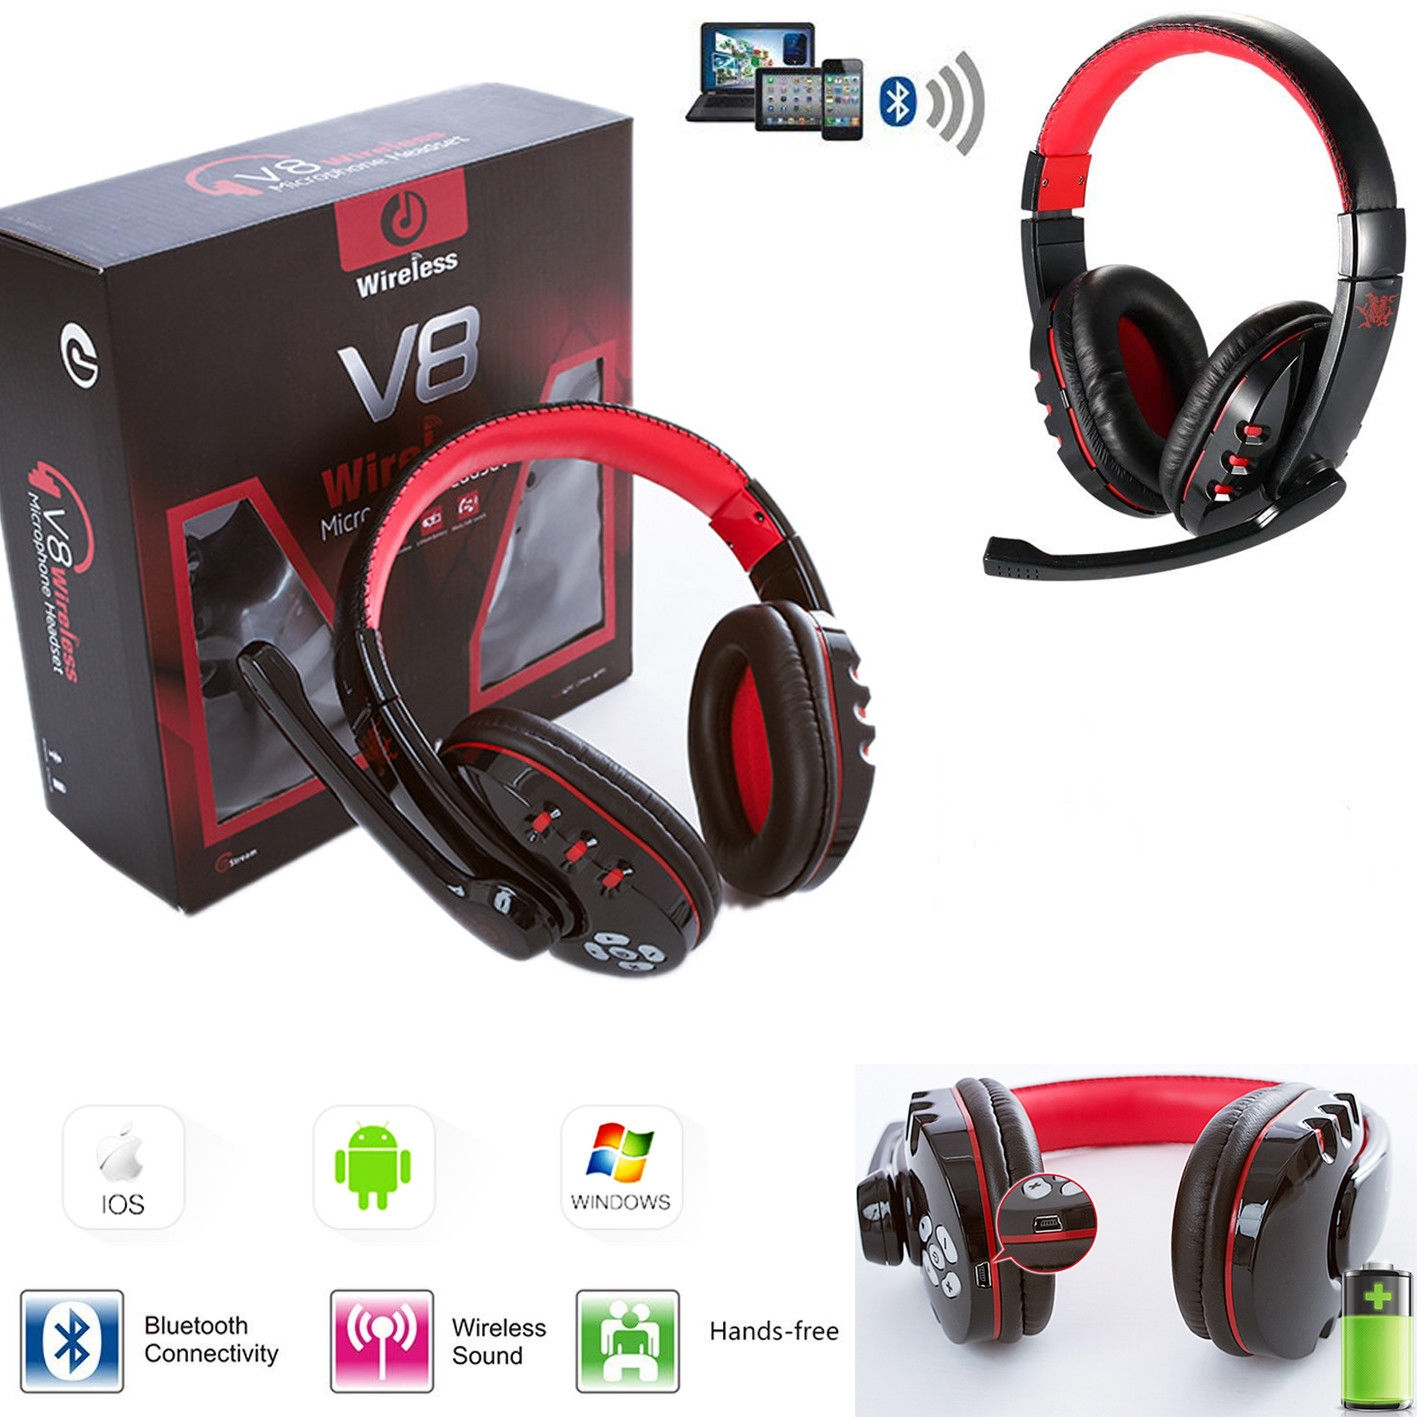 Veryke Bluetooth Headphones Best Pc Gamer Over Ear Wireless Headphones With Mic Foldable Headband Ergonomic Designed Soft Earmuffs For Pc Laptops And Smartphones Waet017 Walmart Com Walmart Com